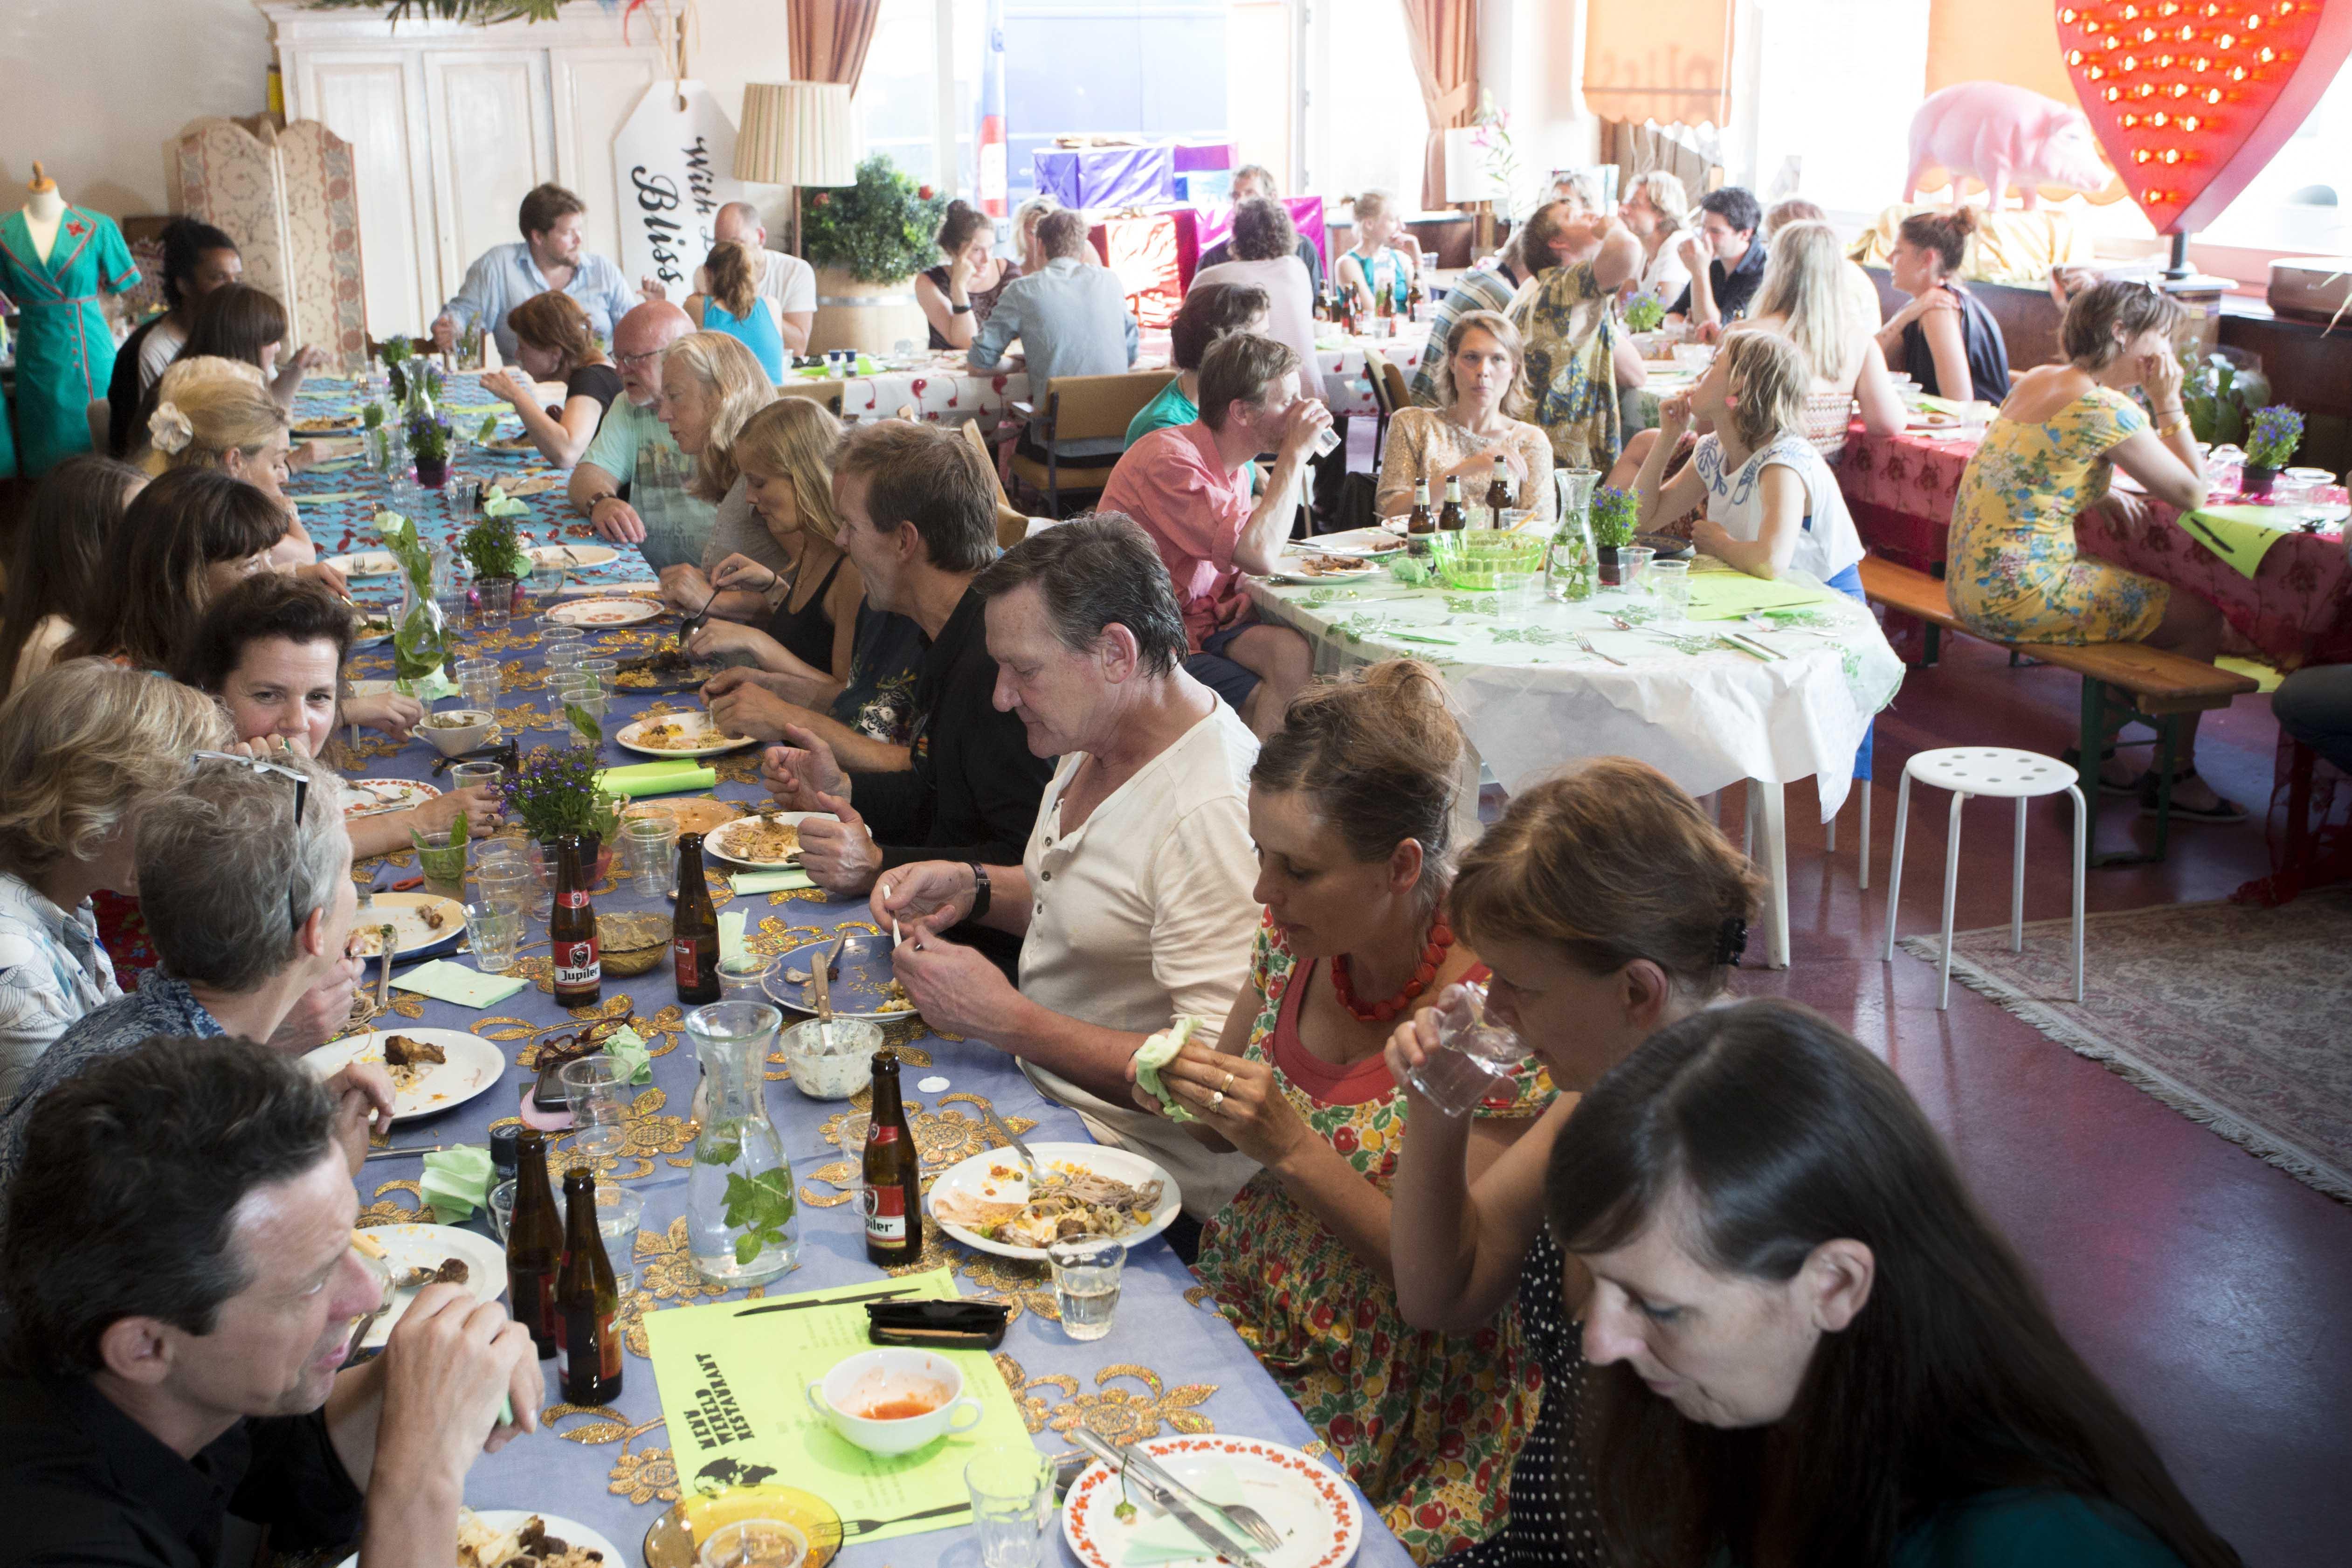 Wereldrestaurant Pers11april 2015